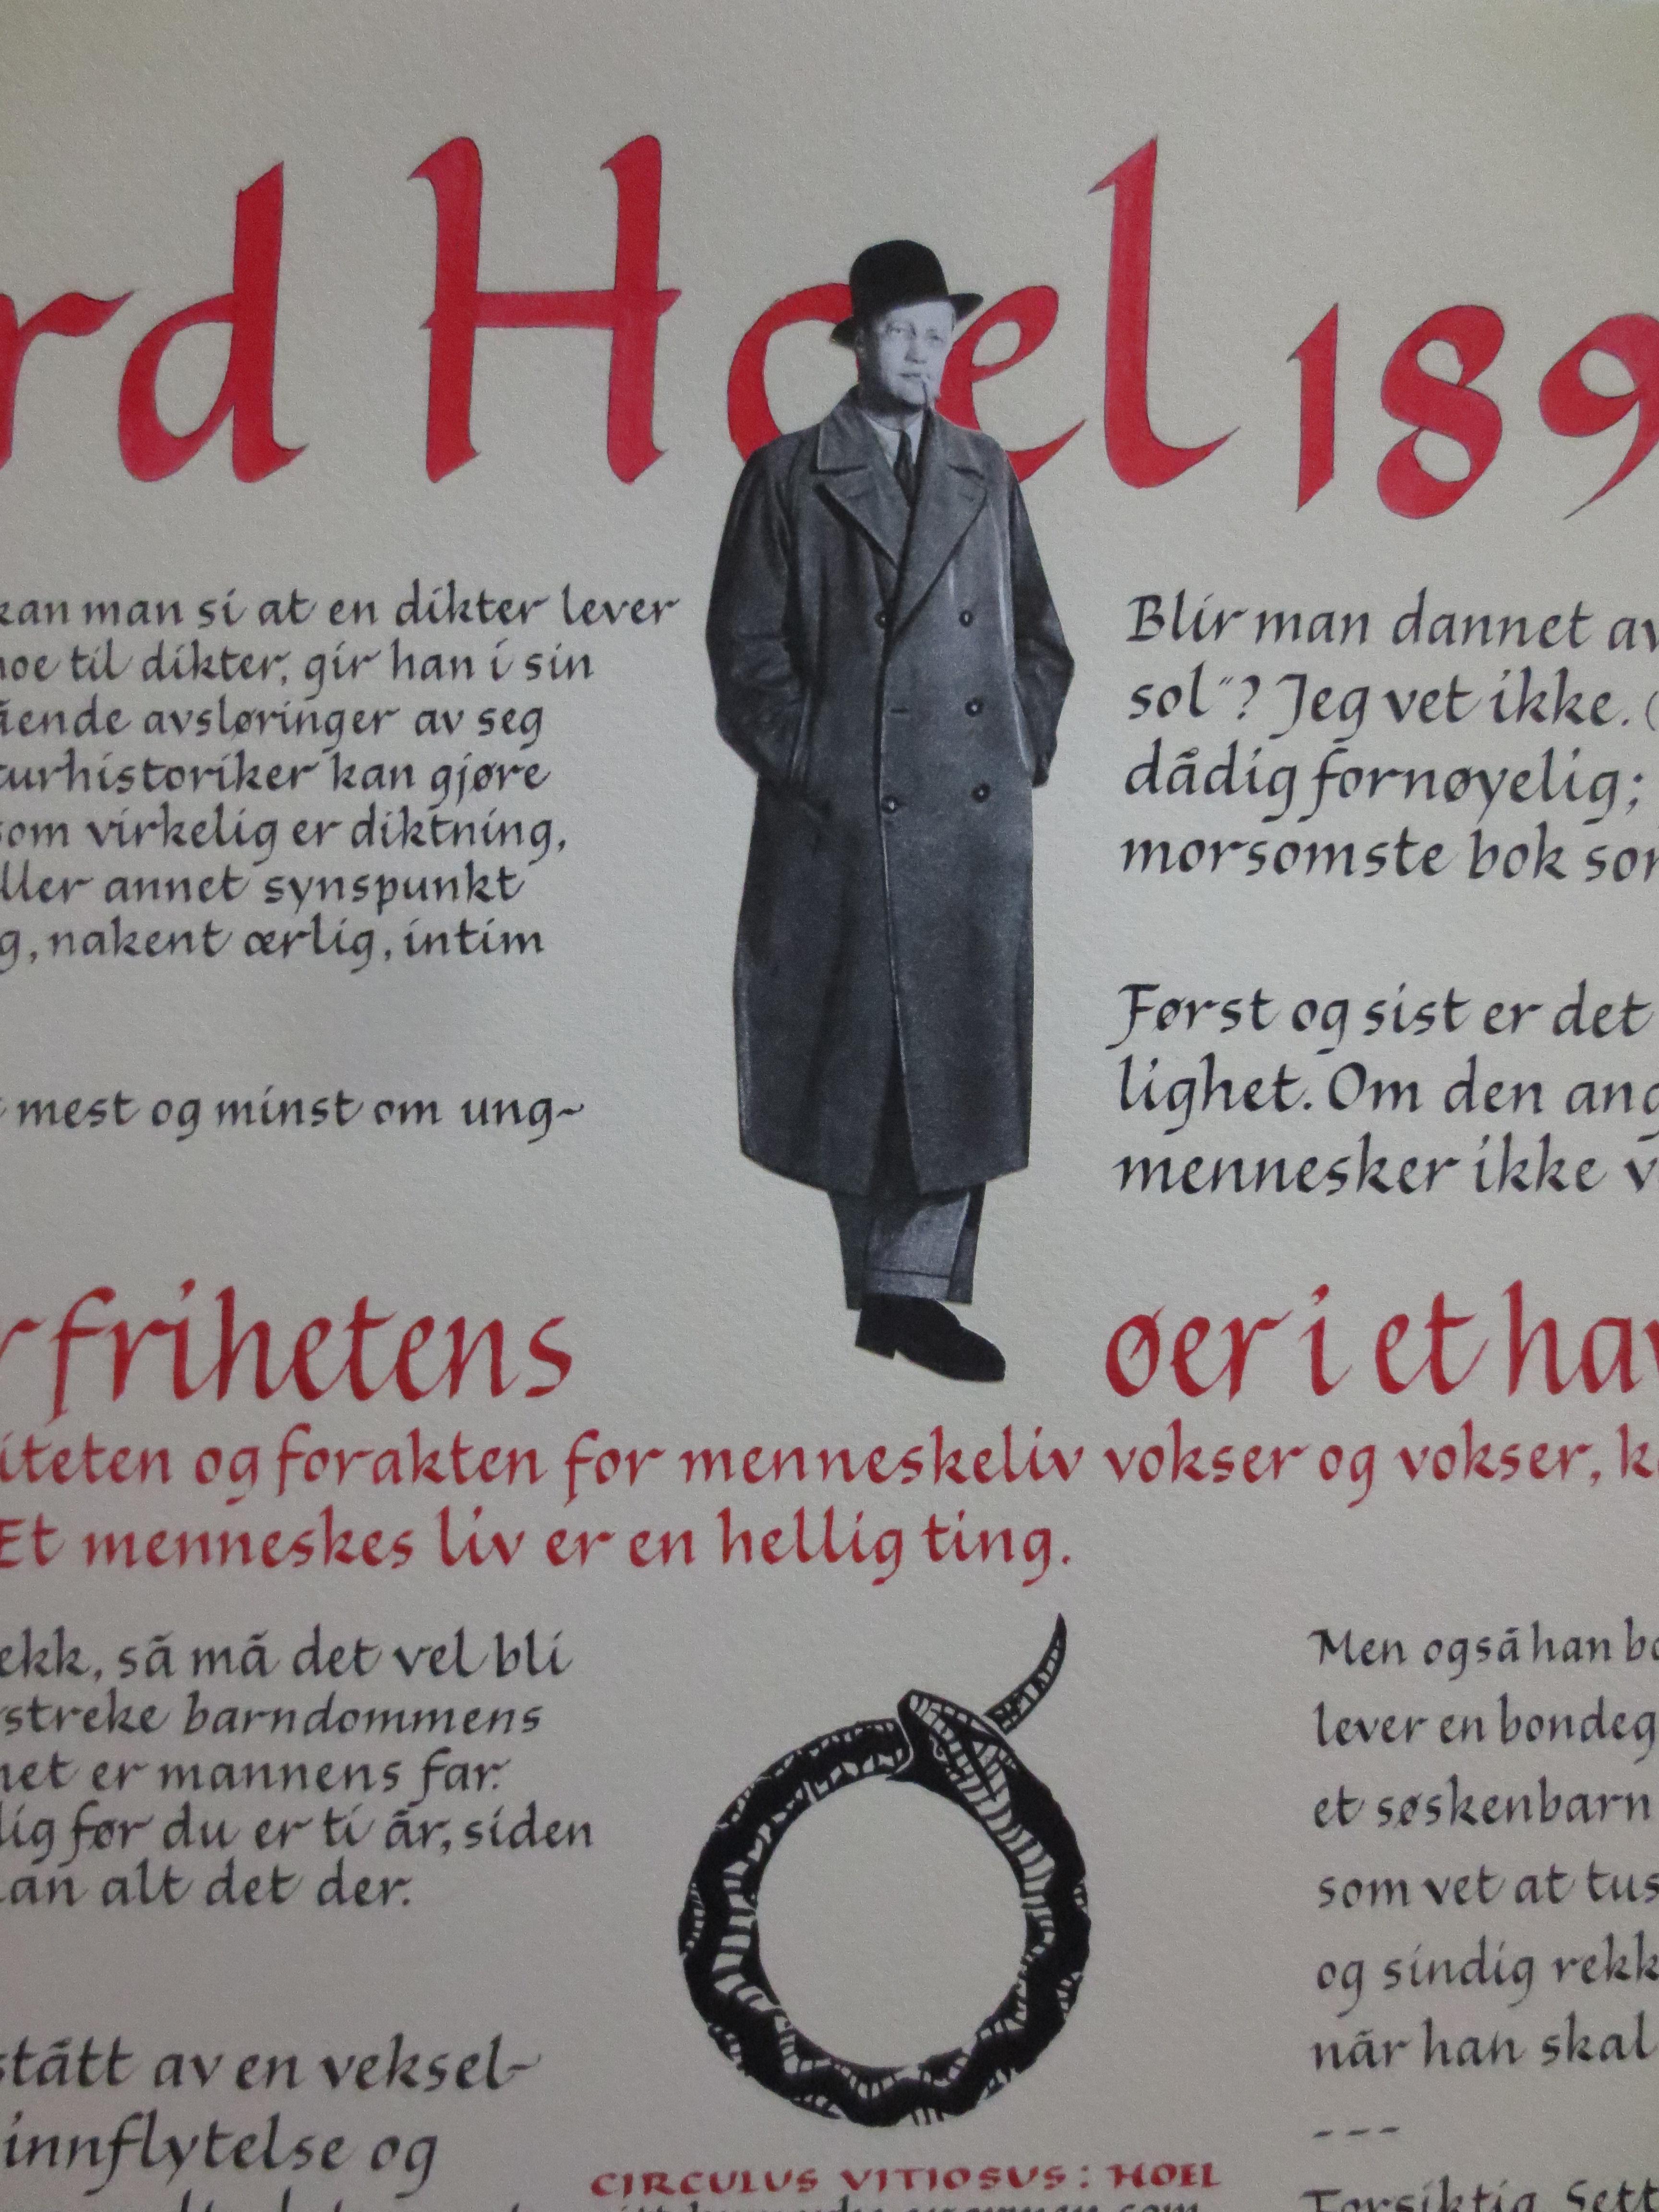 Sigurd Hoel